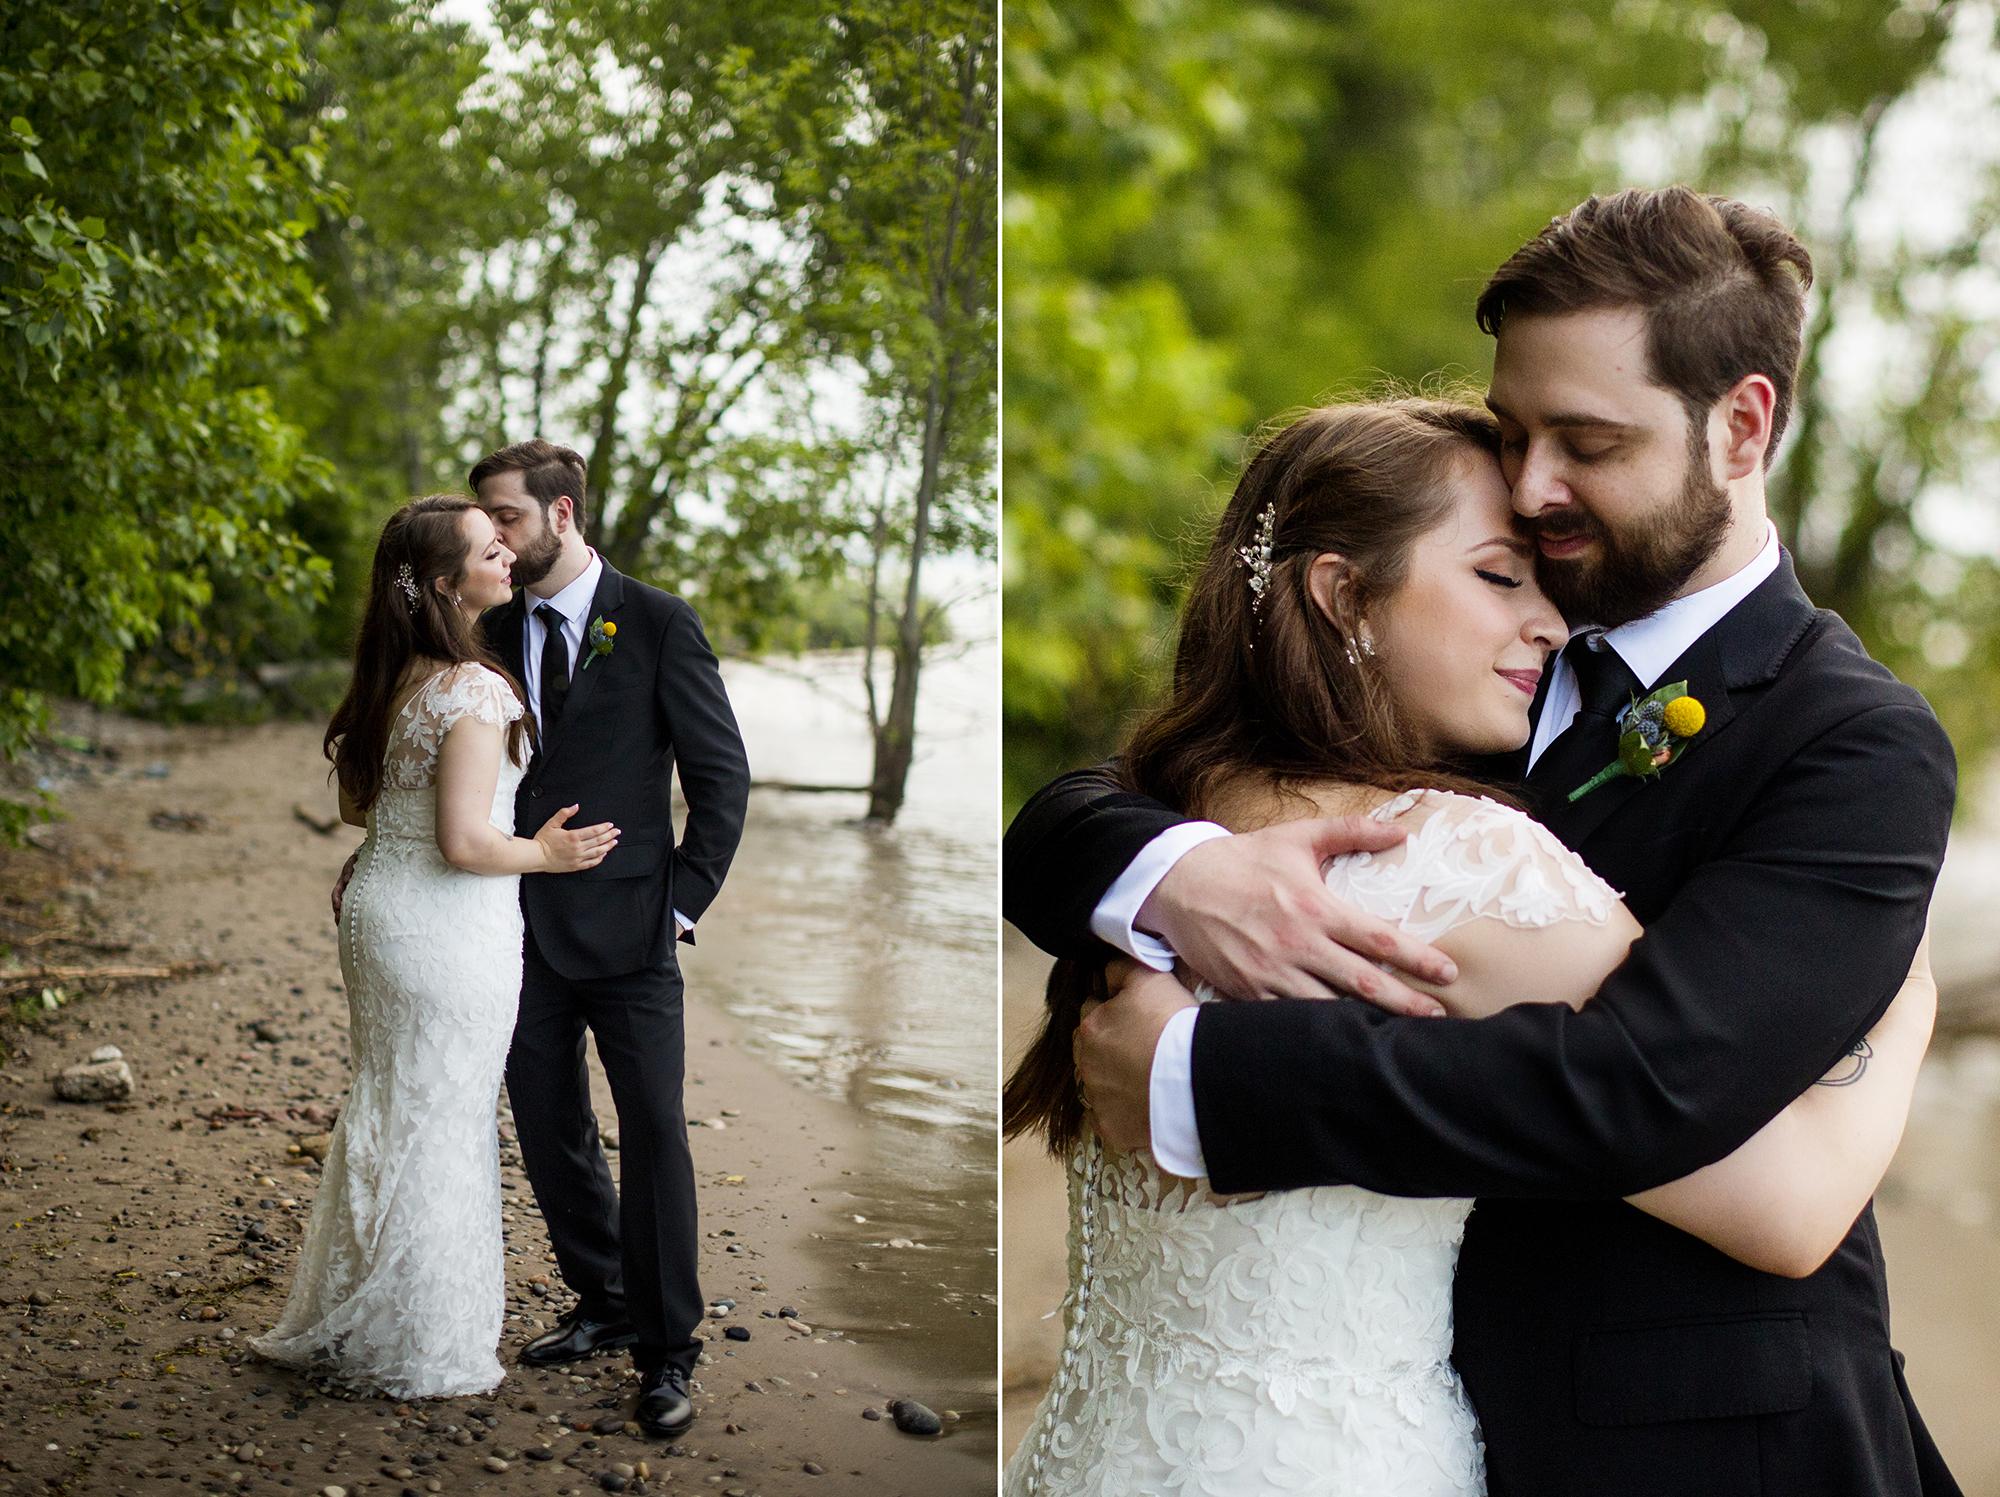 Seriously_Sabrina_Photography_Milwaukee_Wisconsin_Wedding_Schlitz_Audubon_Nature_Center_BrunderRife112.jpg